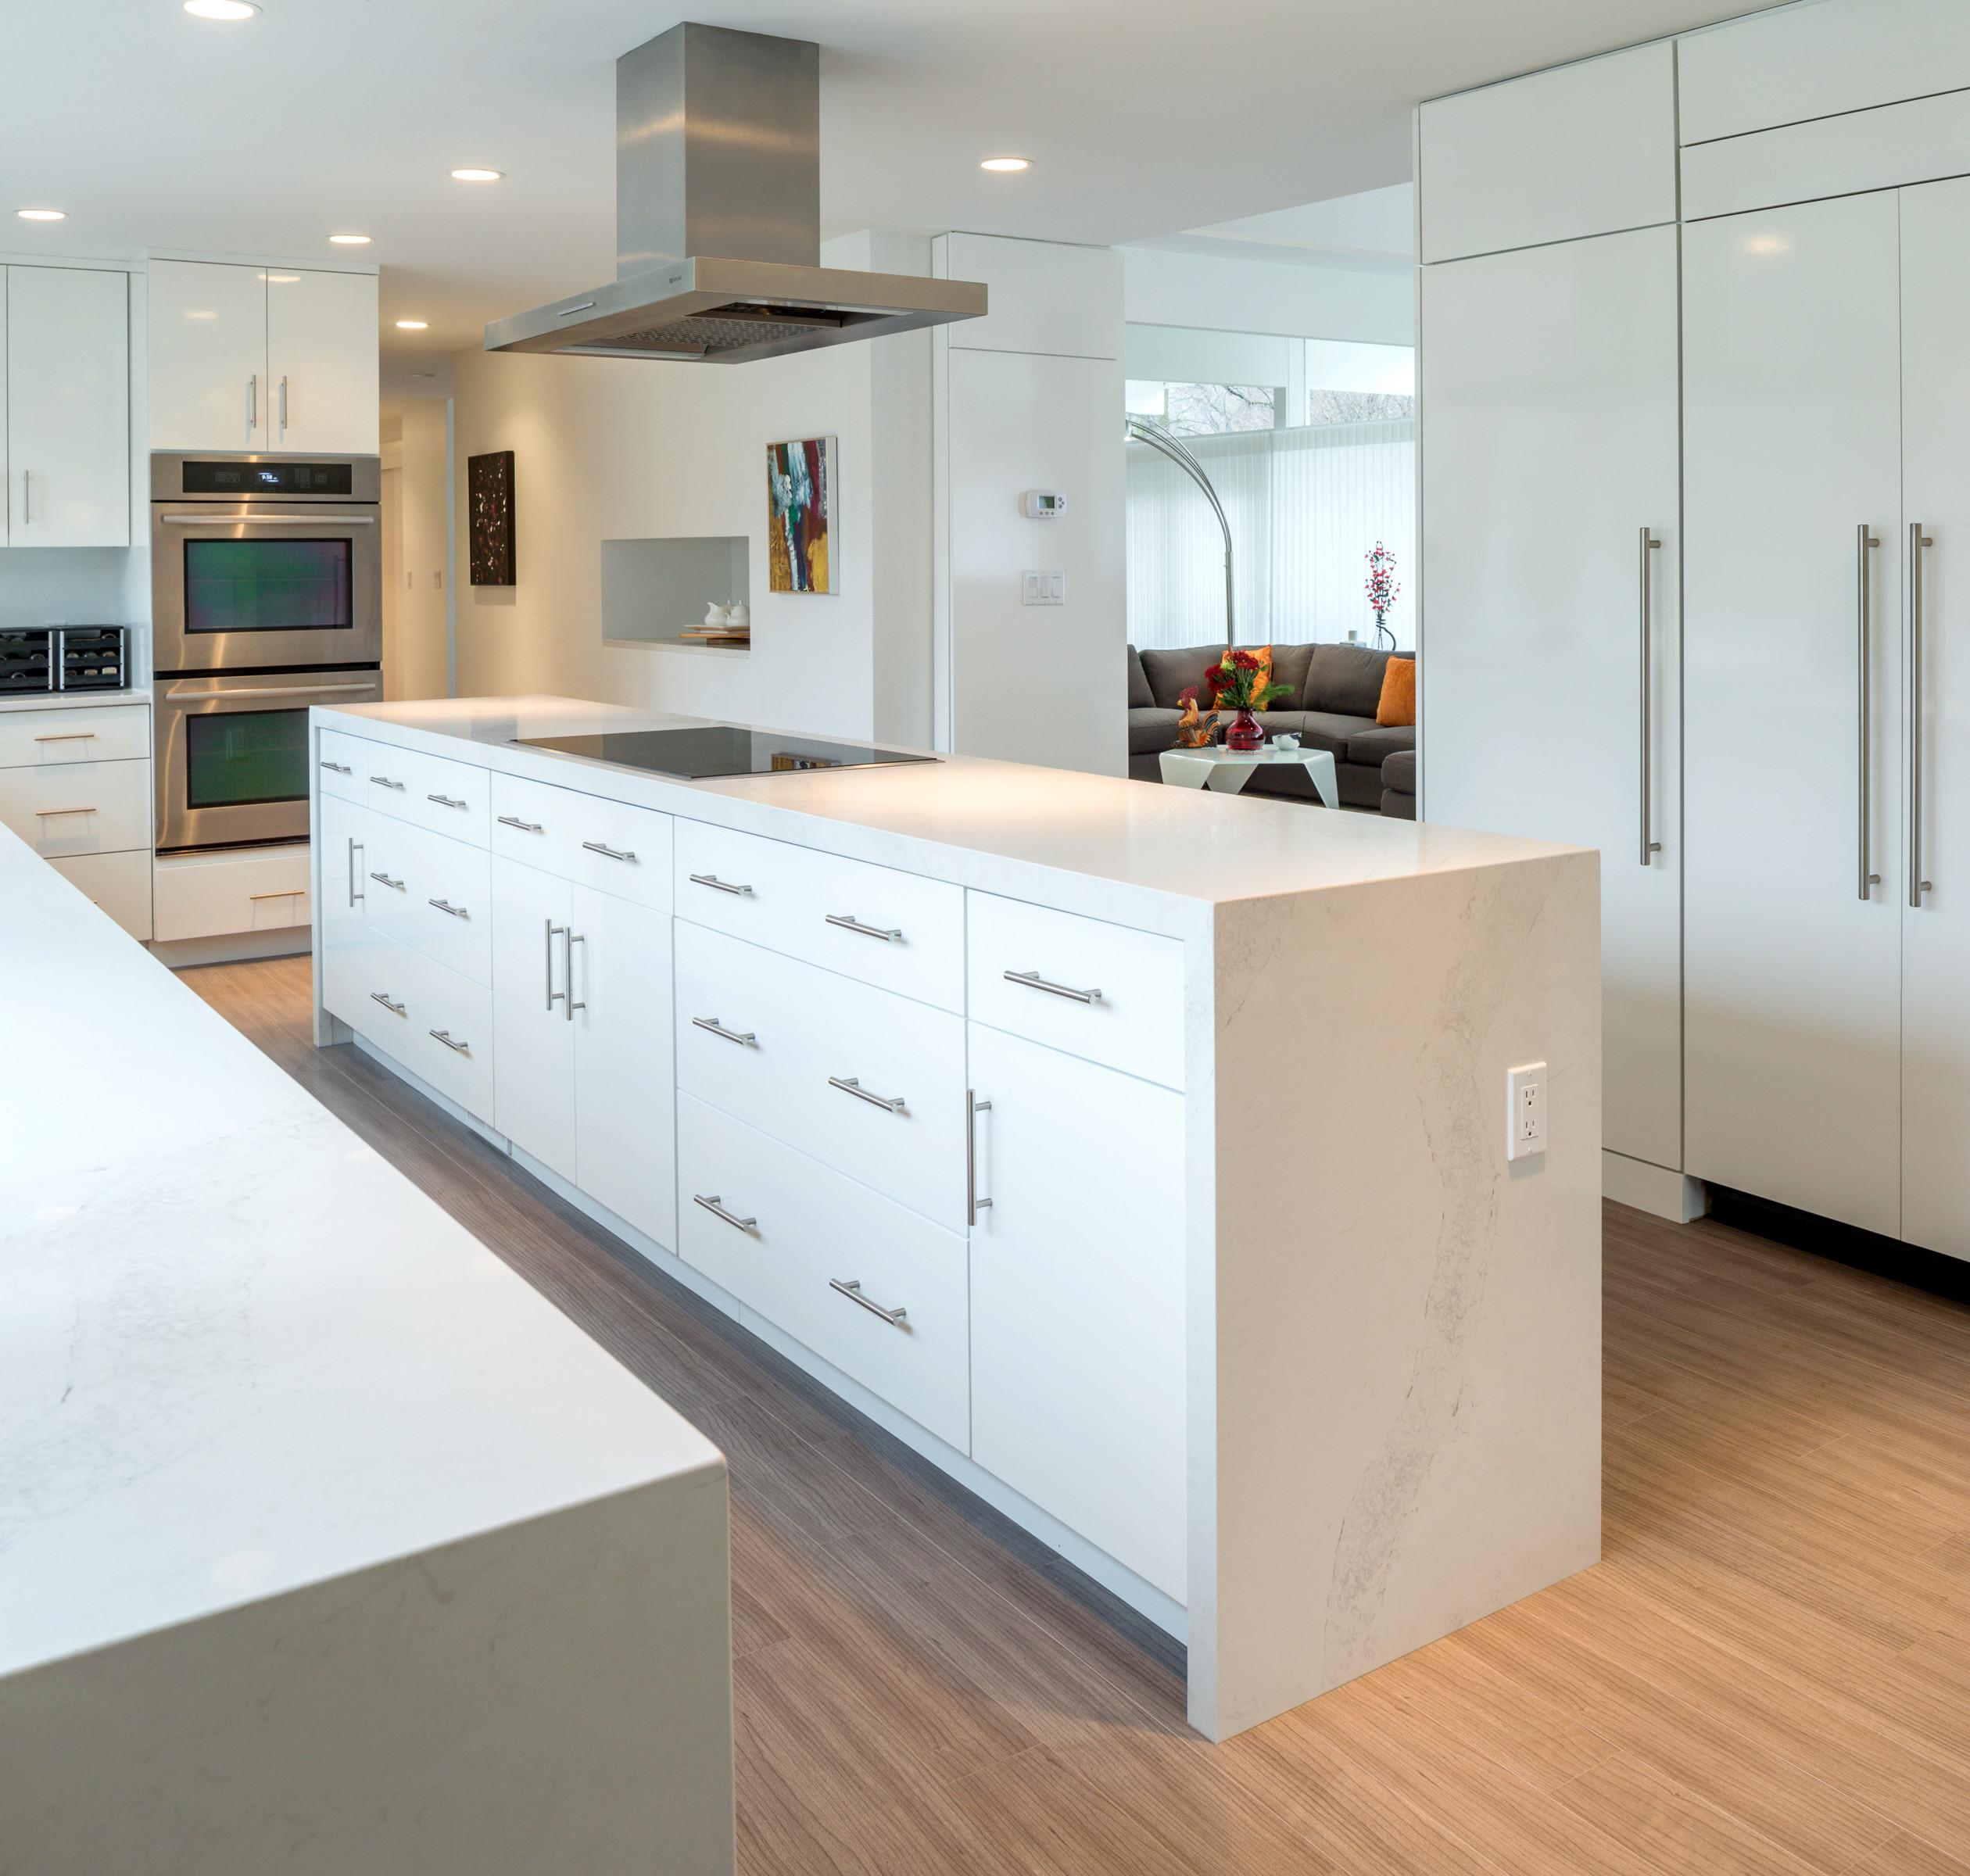 Certified Luxury Builders - J Paul Builders - Pikesville, MD - Custom Home A